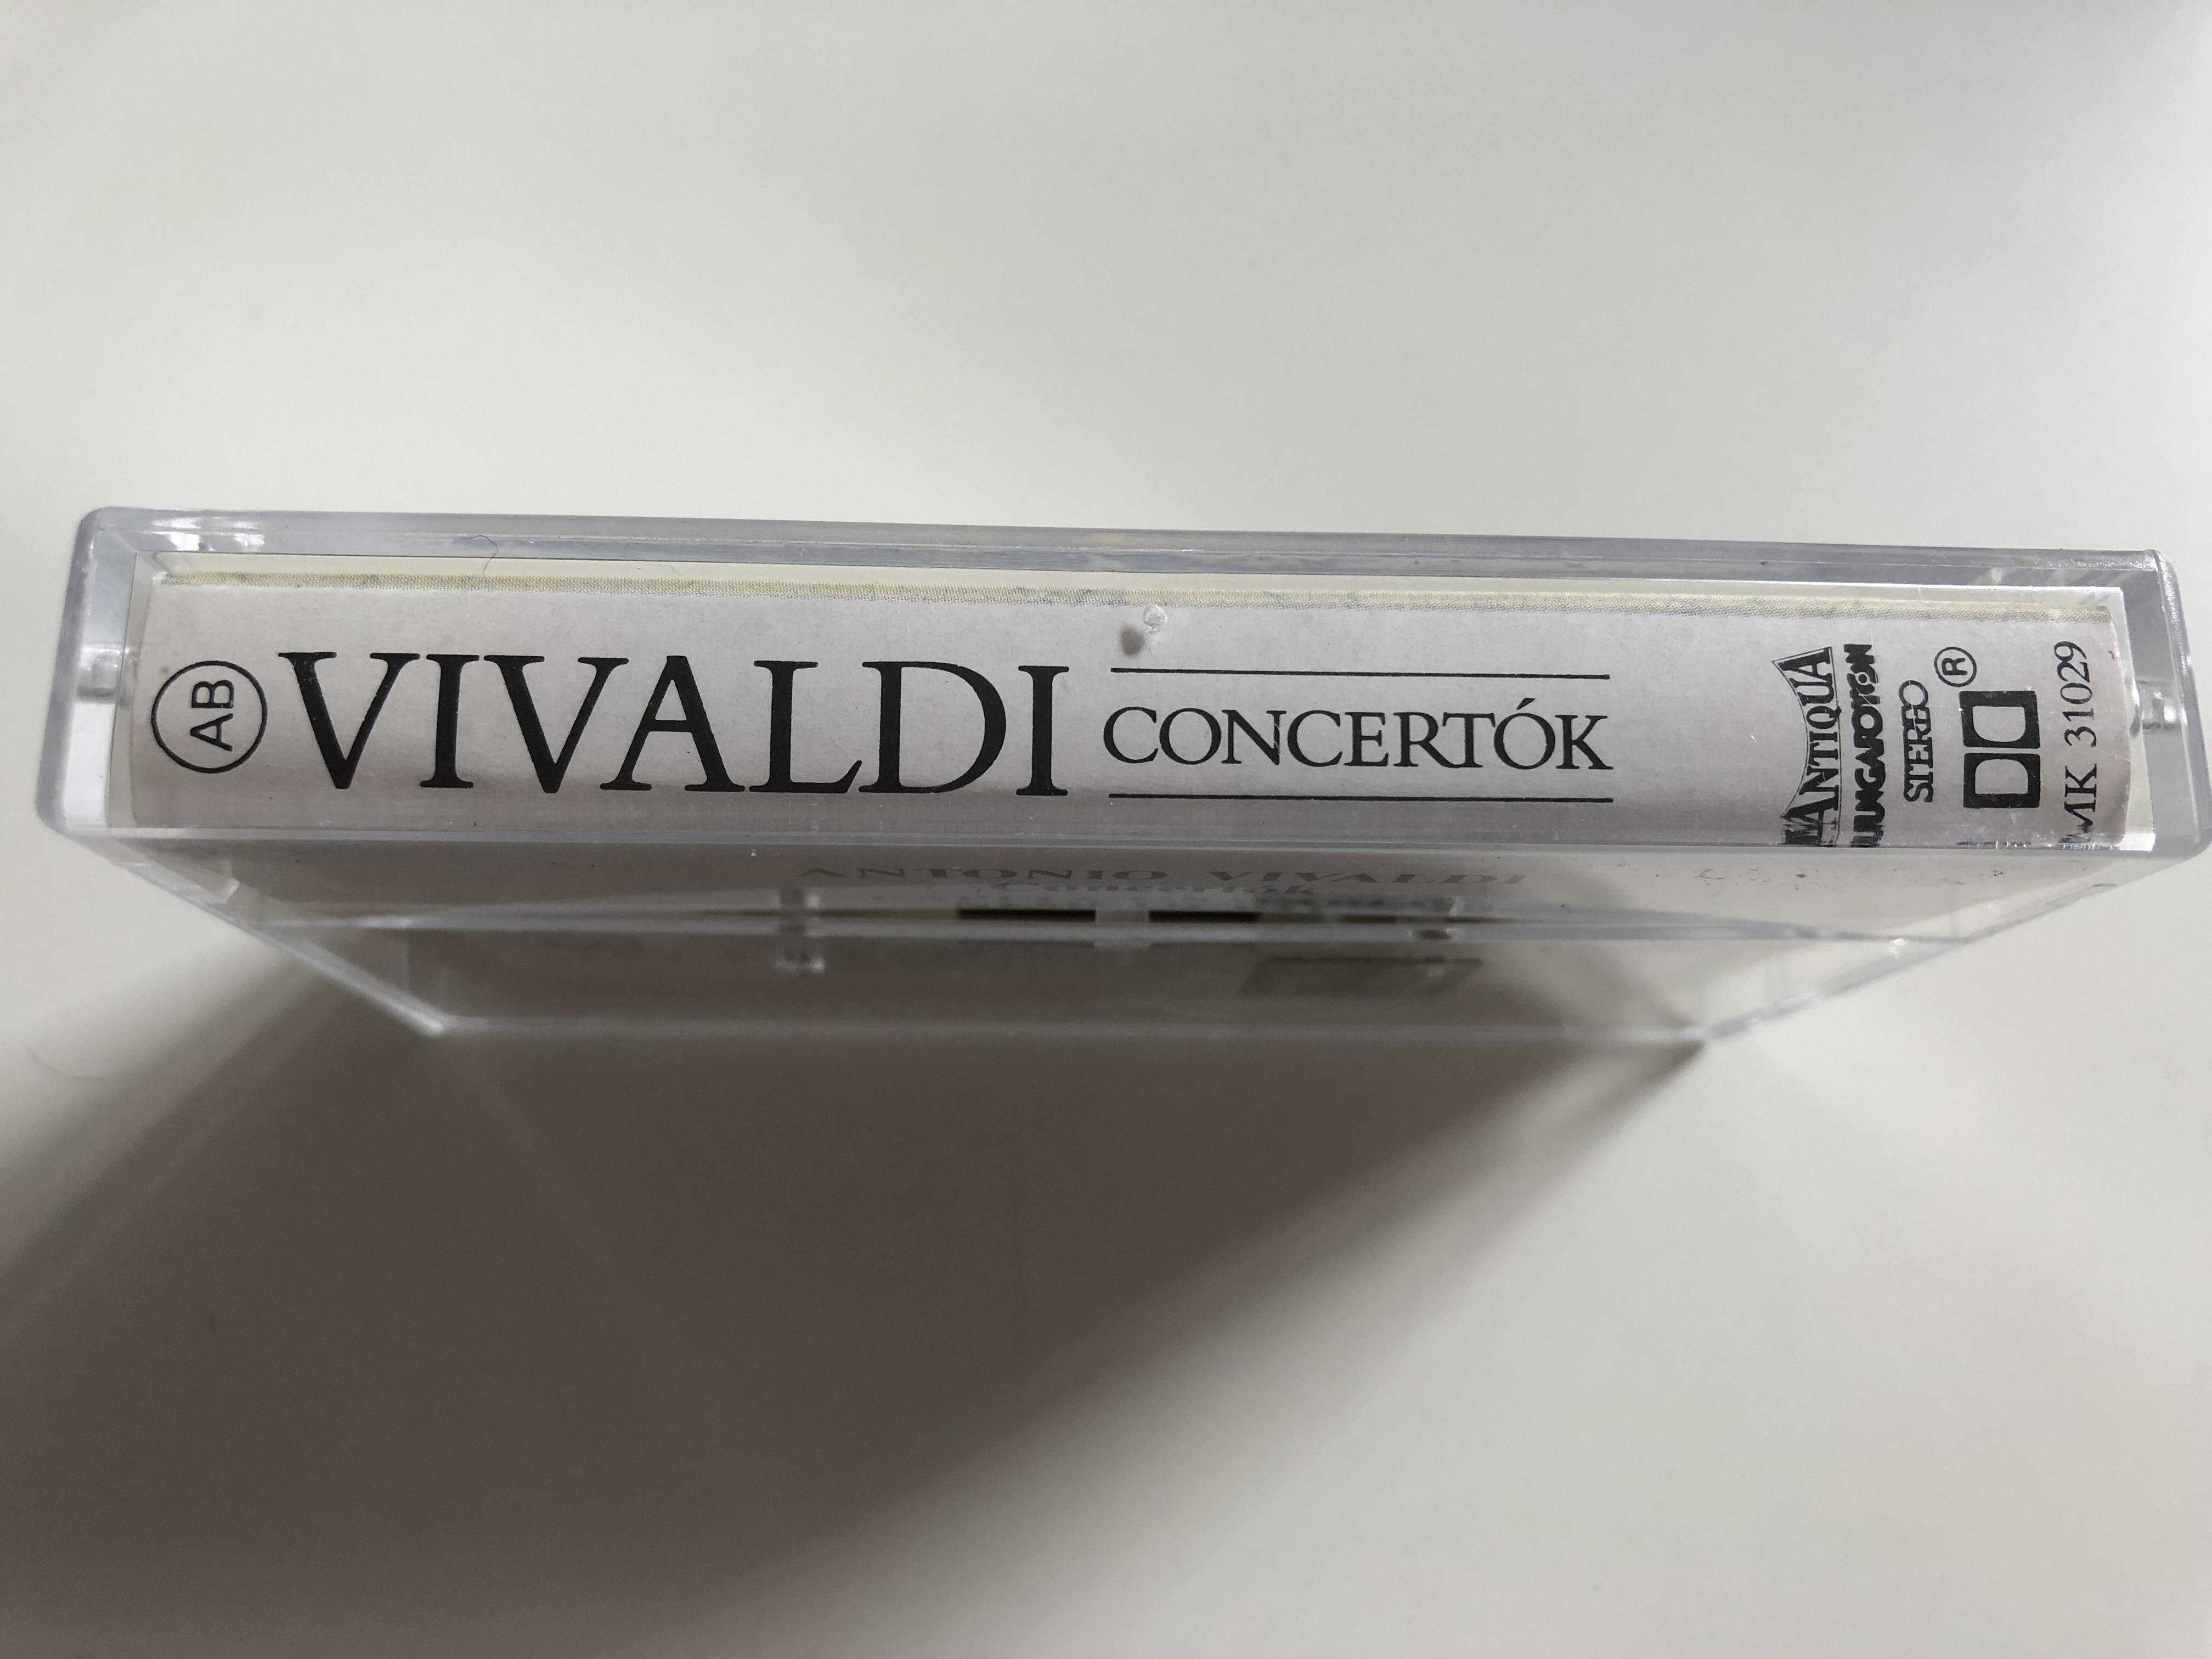 antonio-vivaldi-concert-k-capella-savaria-nemeth-pal-hungaroton-antiqua-cassette-stereo-mk-31029-5-.jpg